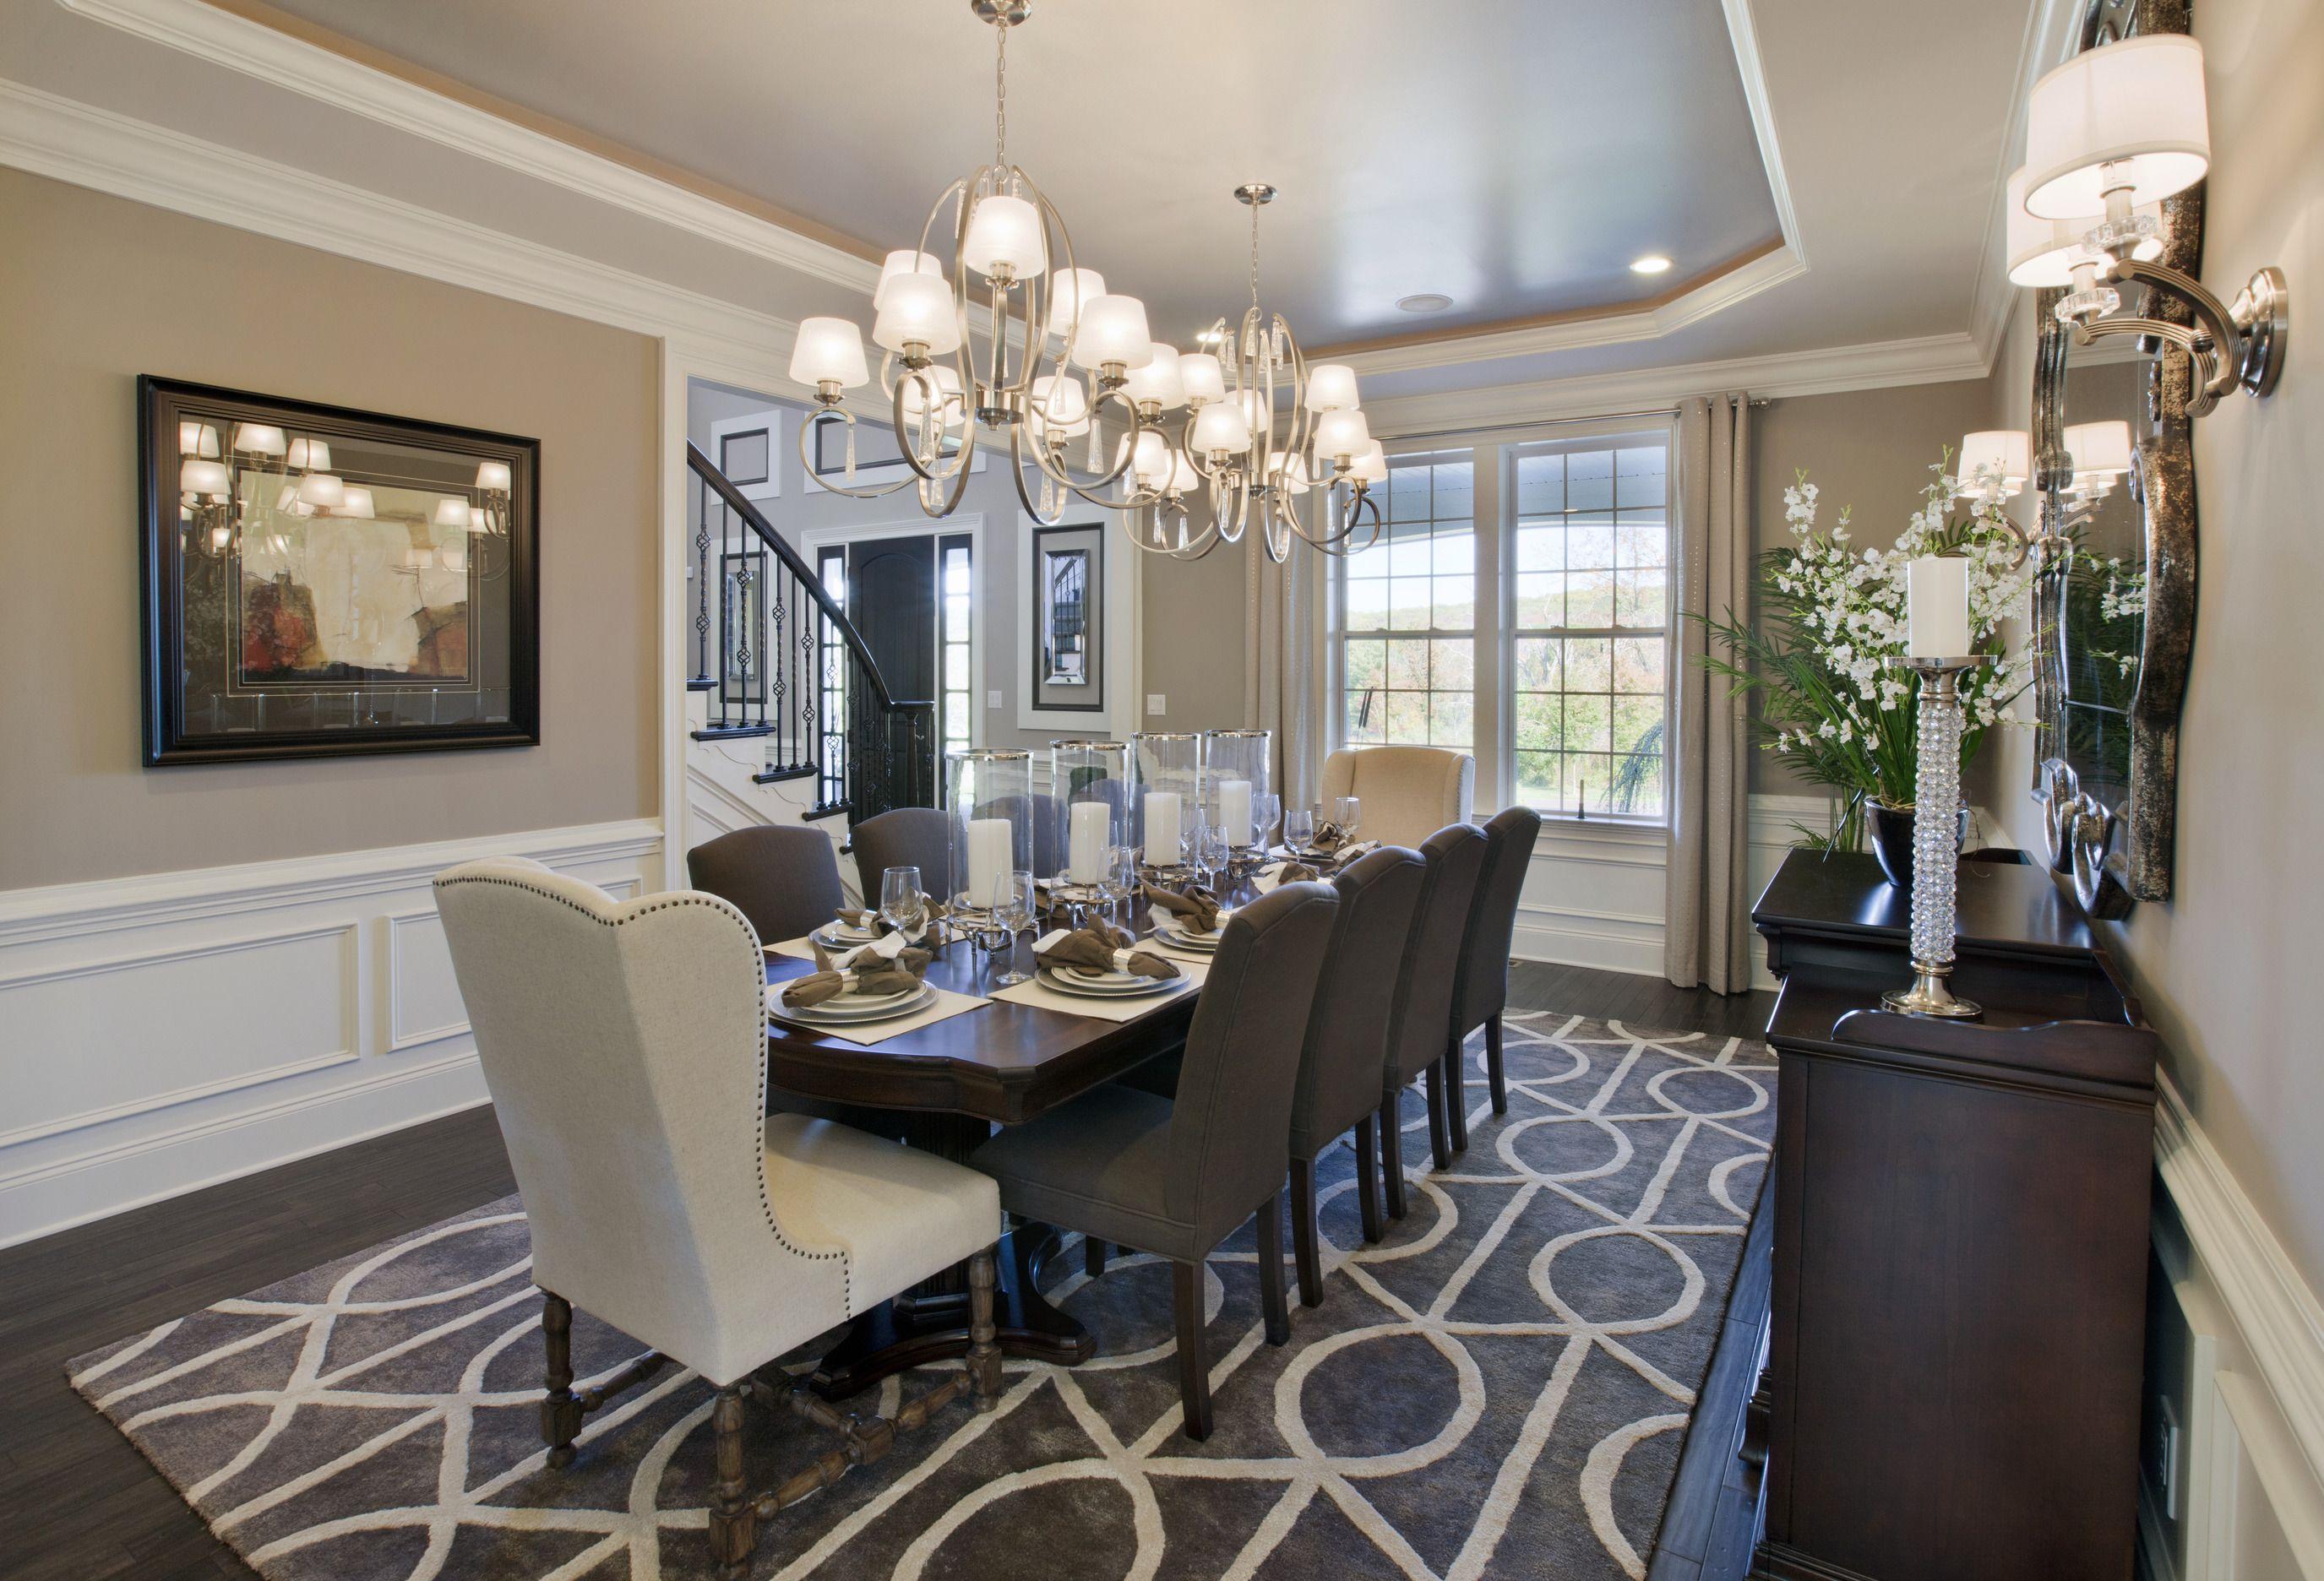 Progress Lighting Exclusive Luxury Home Tour With Award